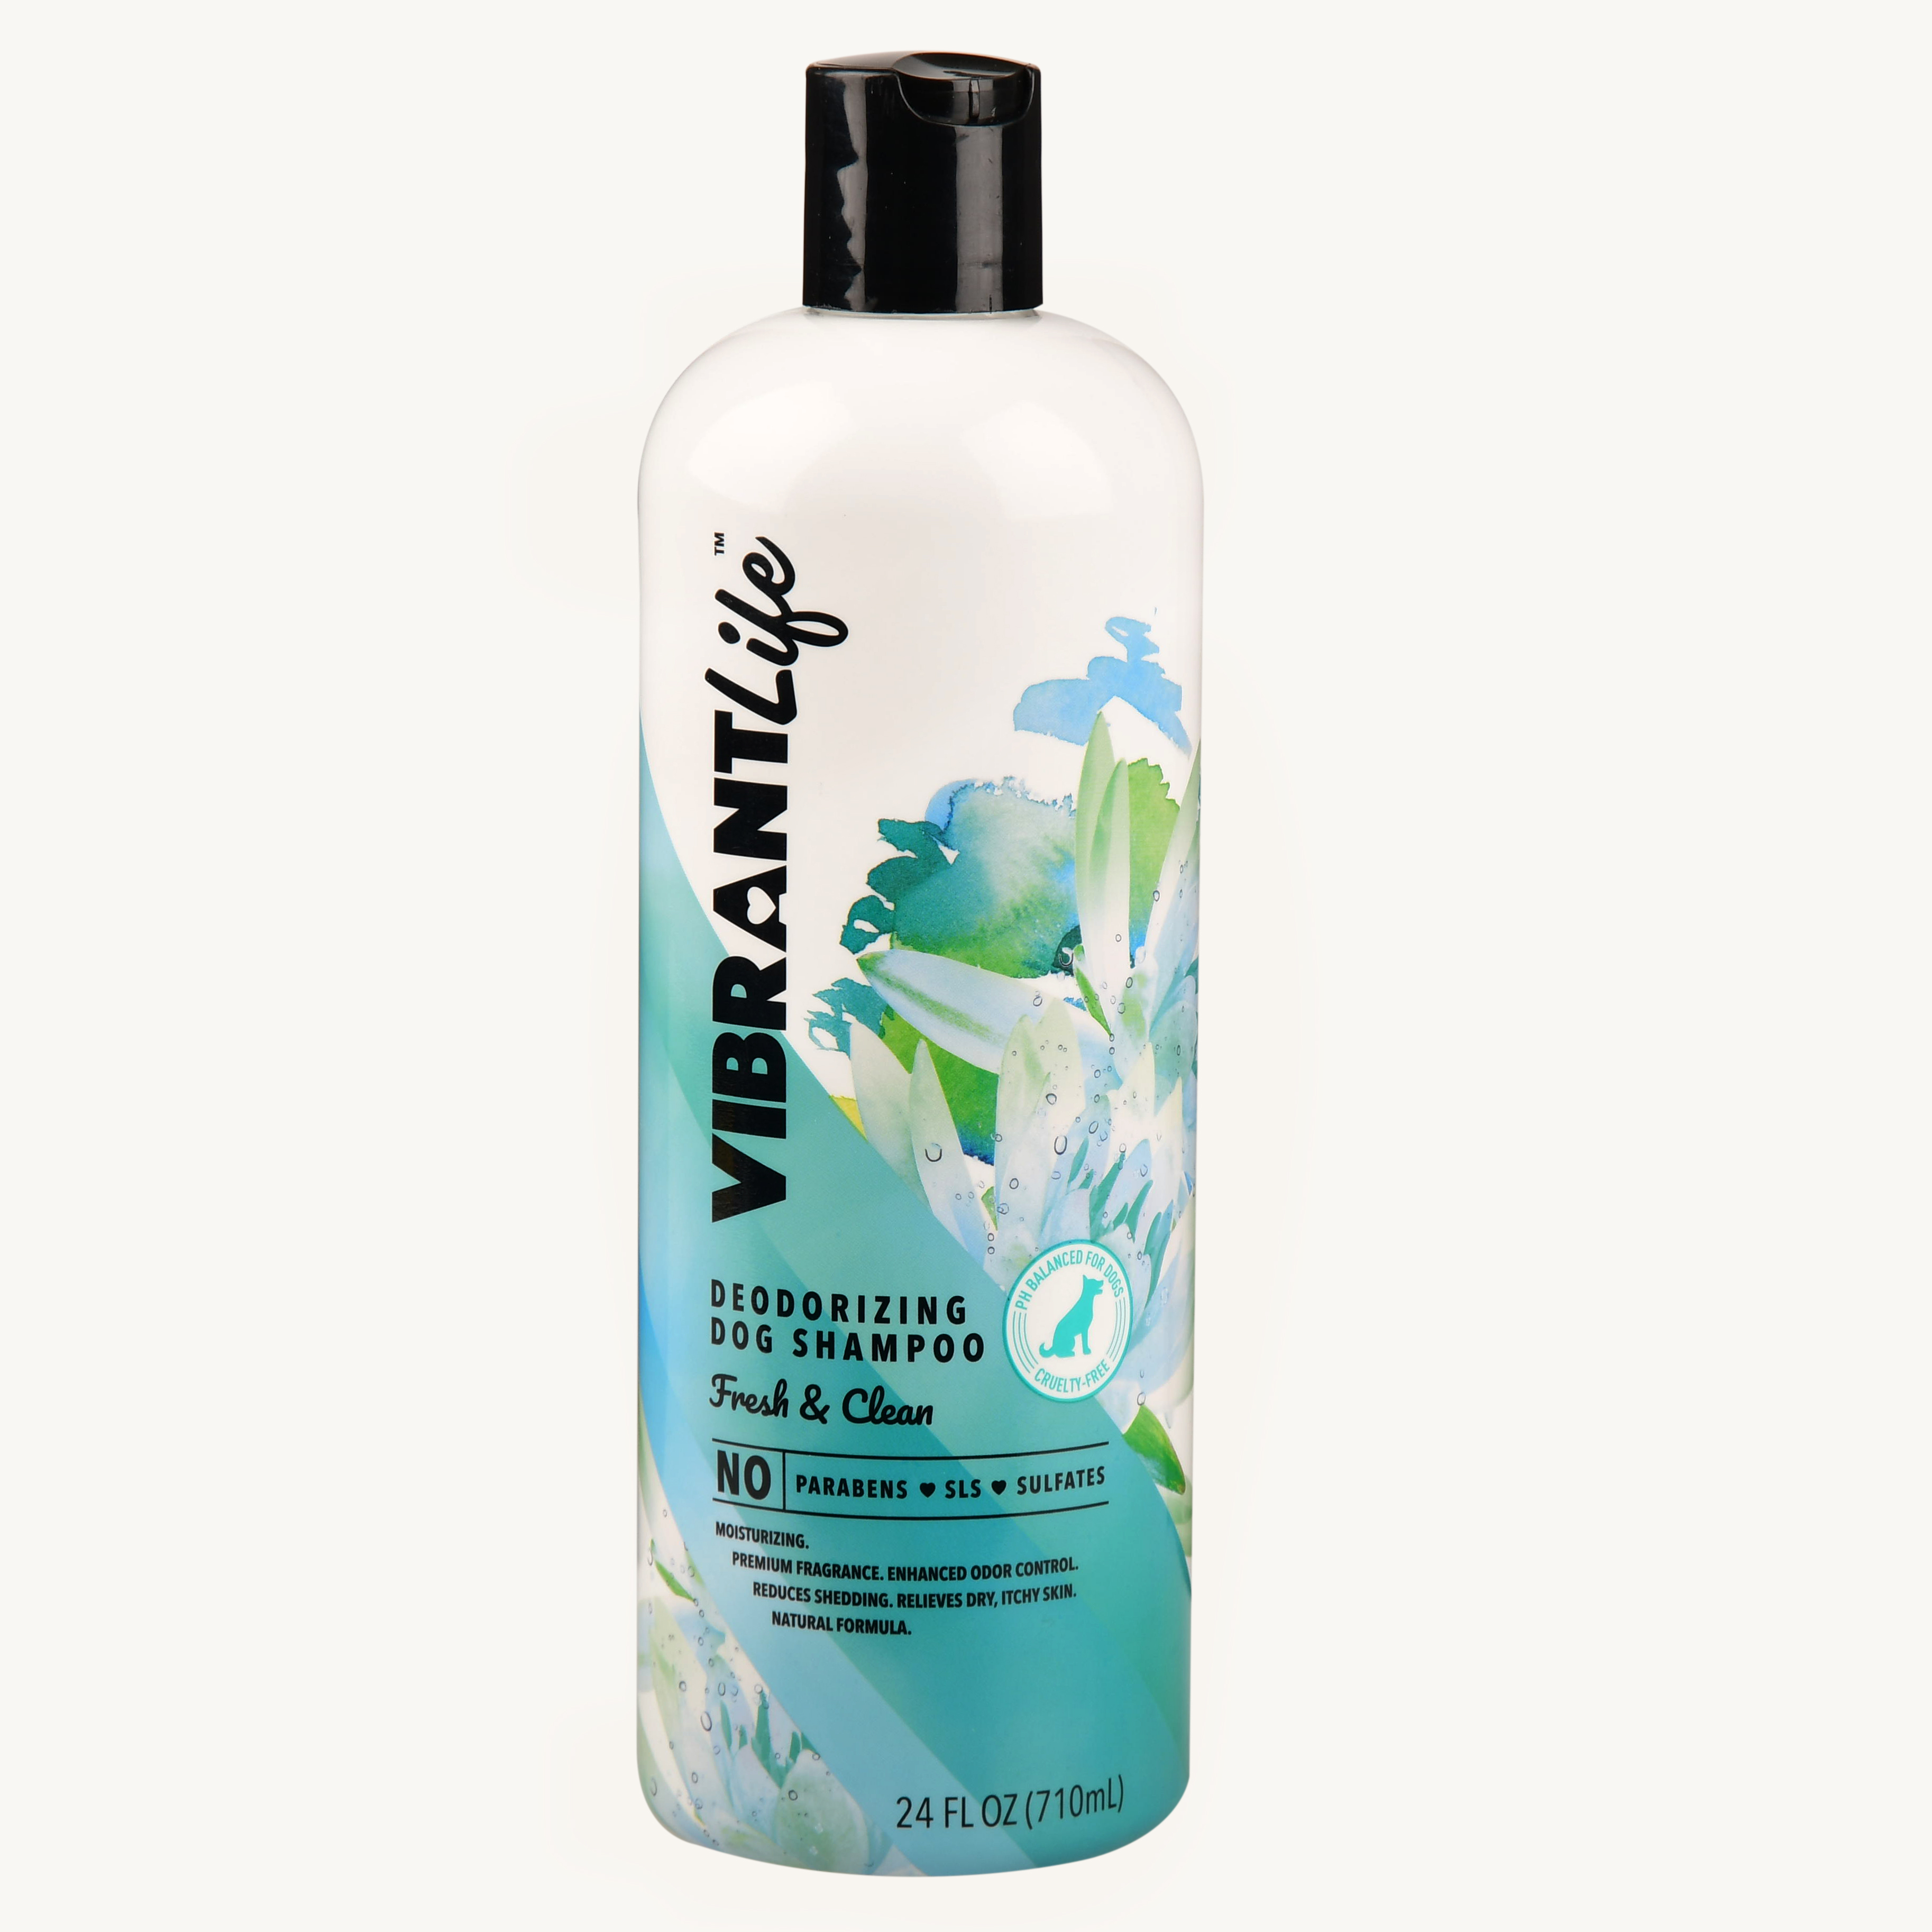 Vibrant life deodorizing dog shampoo fresh & clean, 24-oz bottle